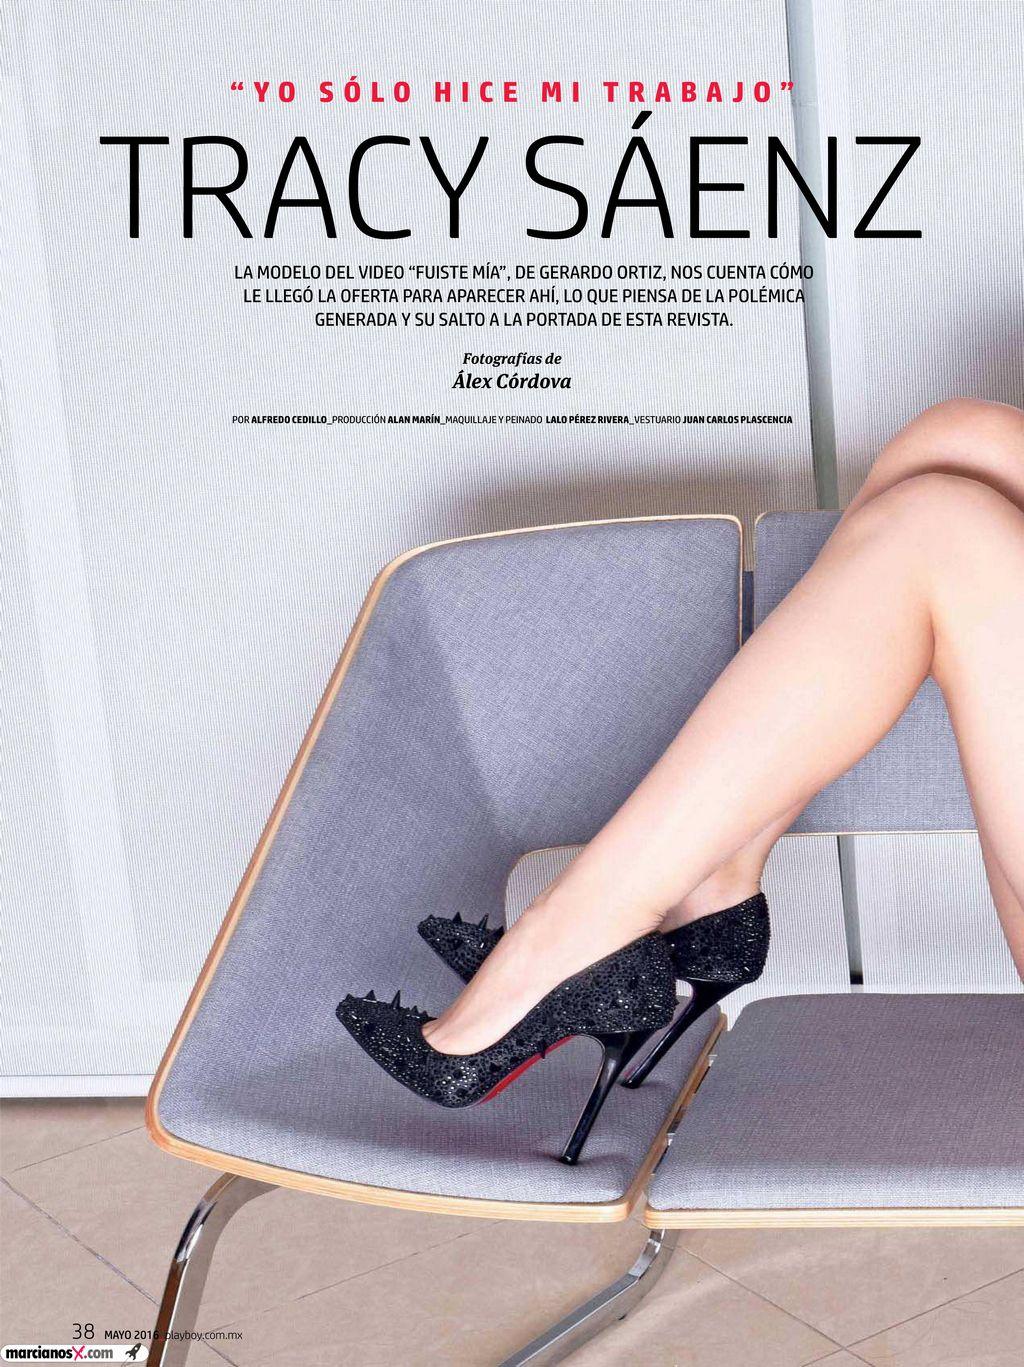 Tracy Saenz Playboy (2)